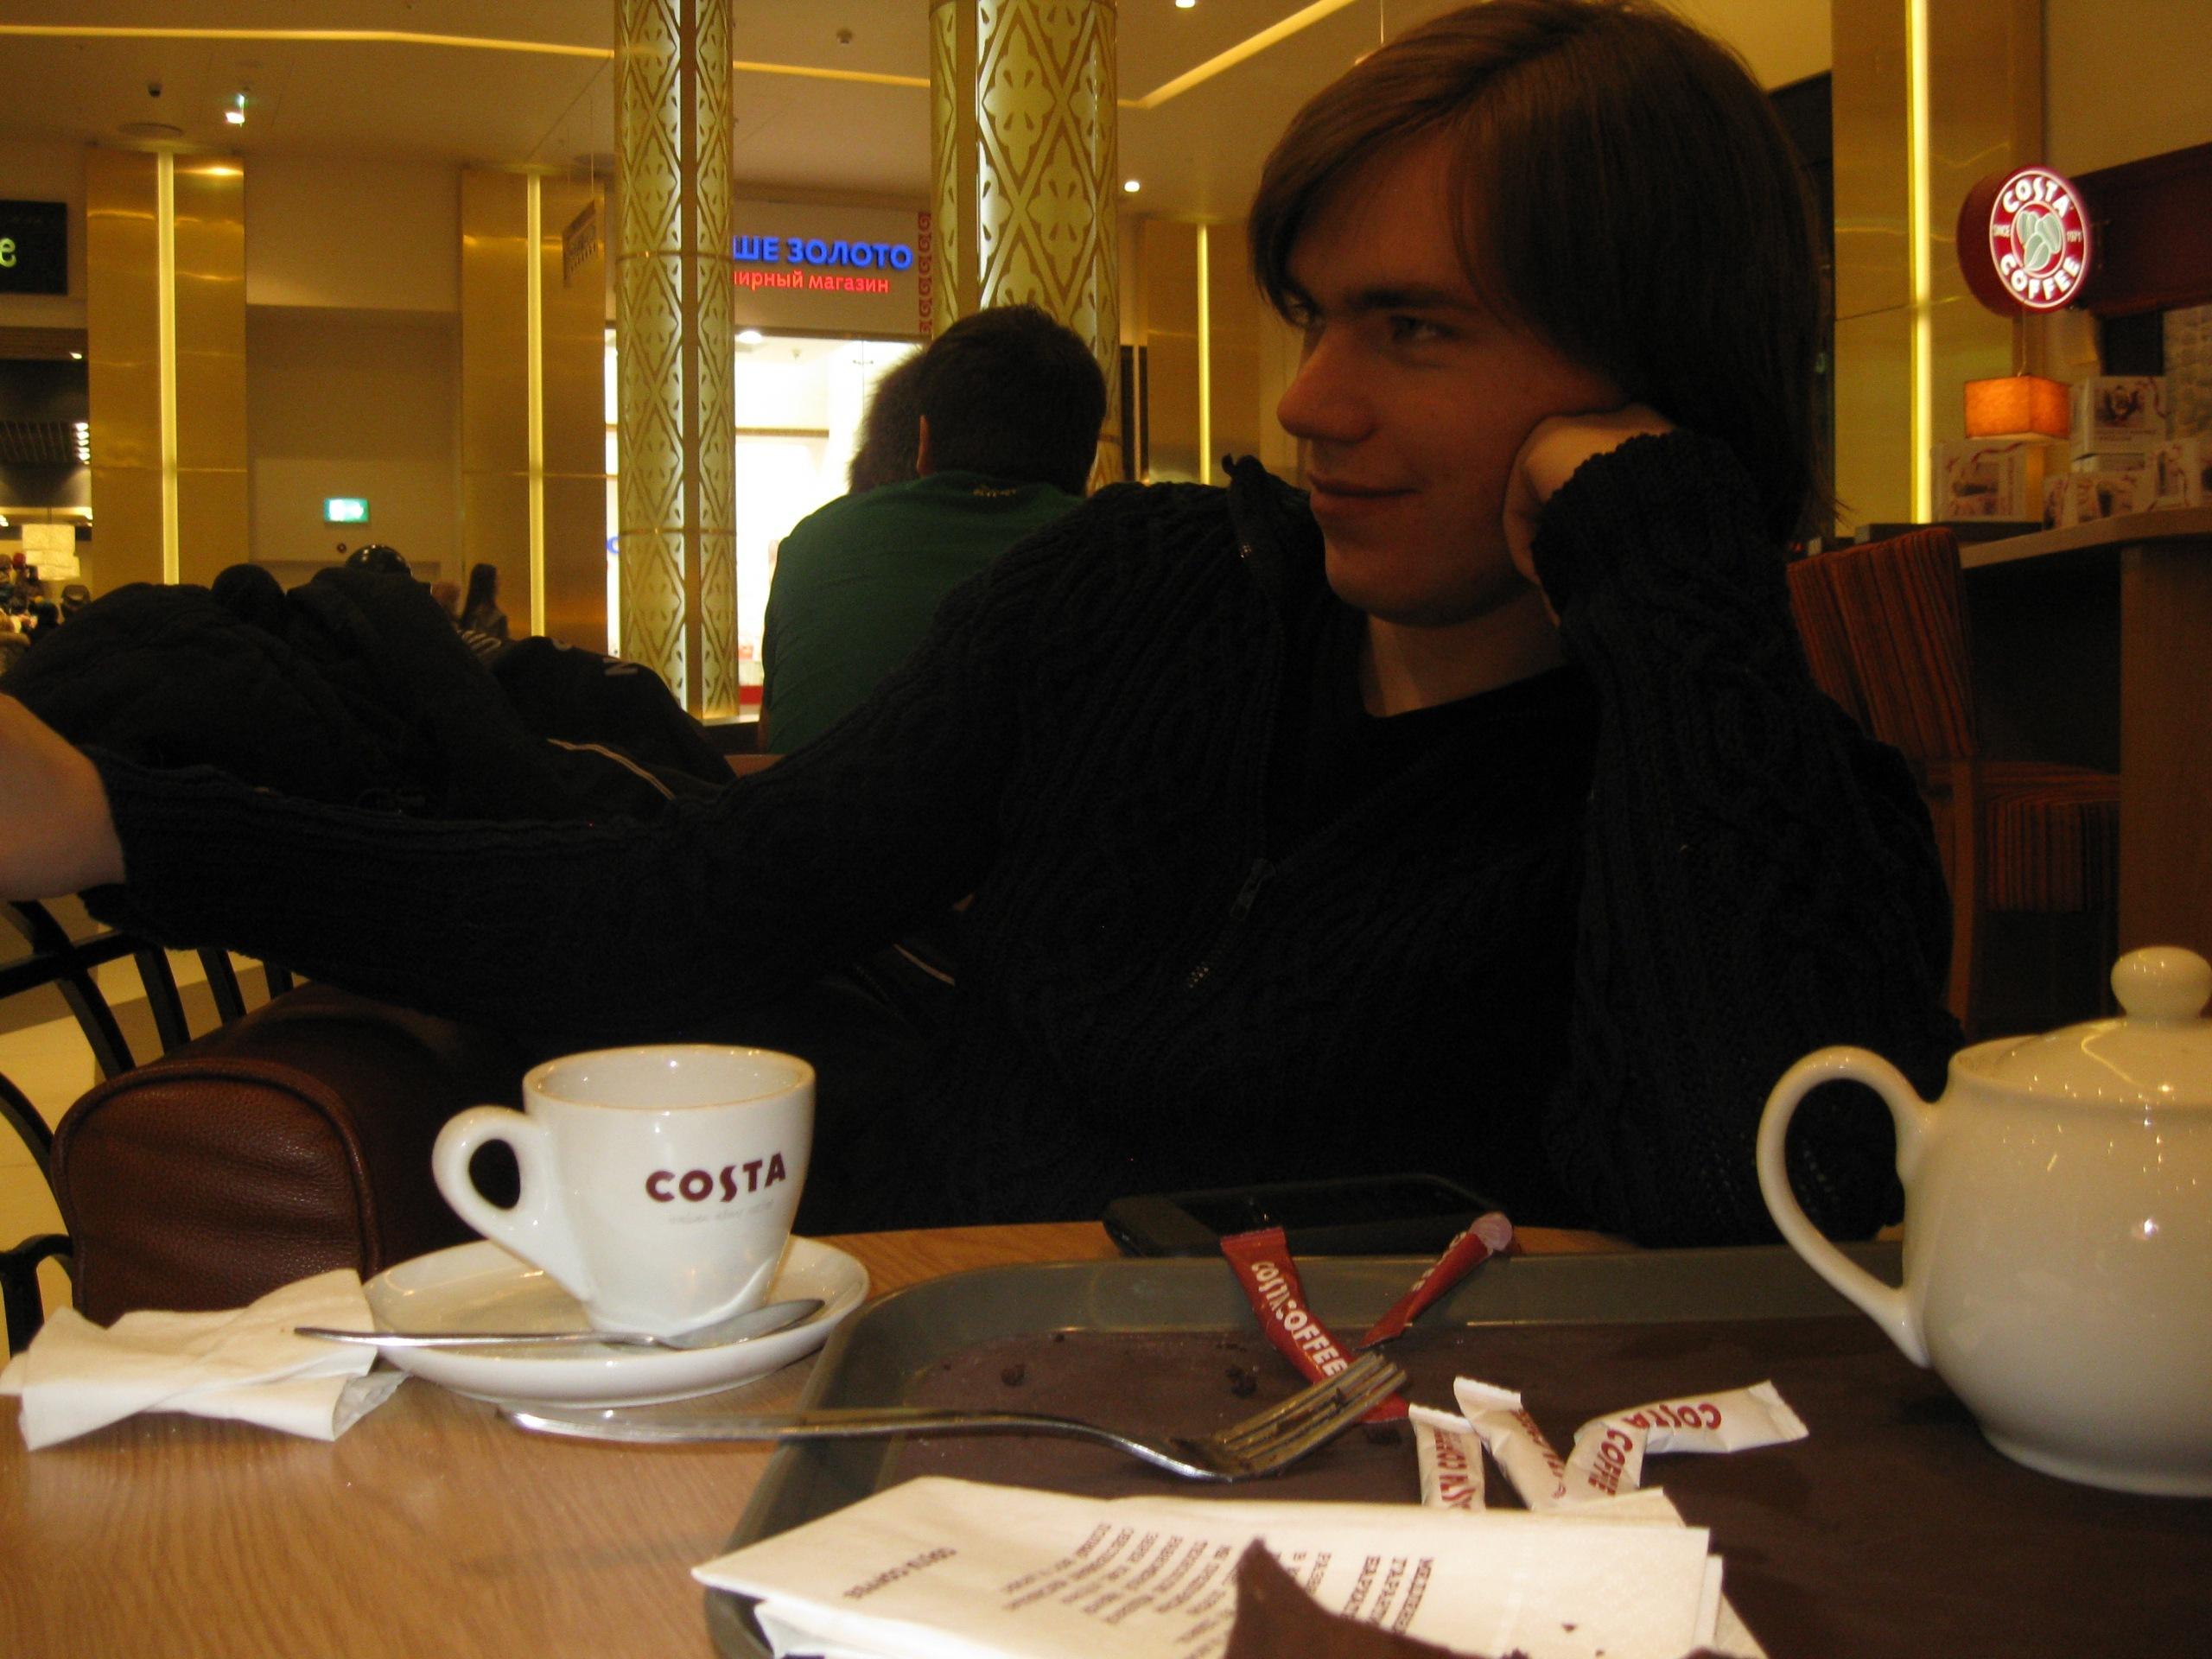 Андрей Лесохин, 35 лет, Санкт-Петербург, Россия. Фото 3